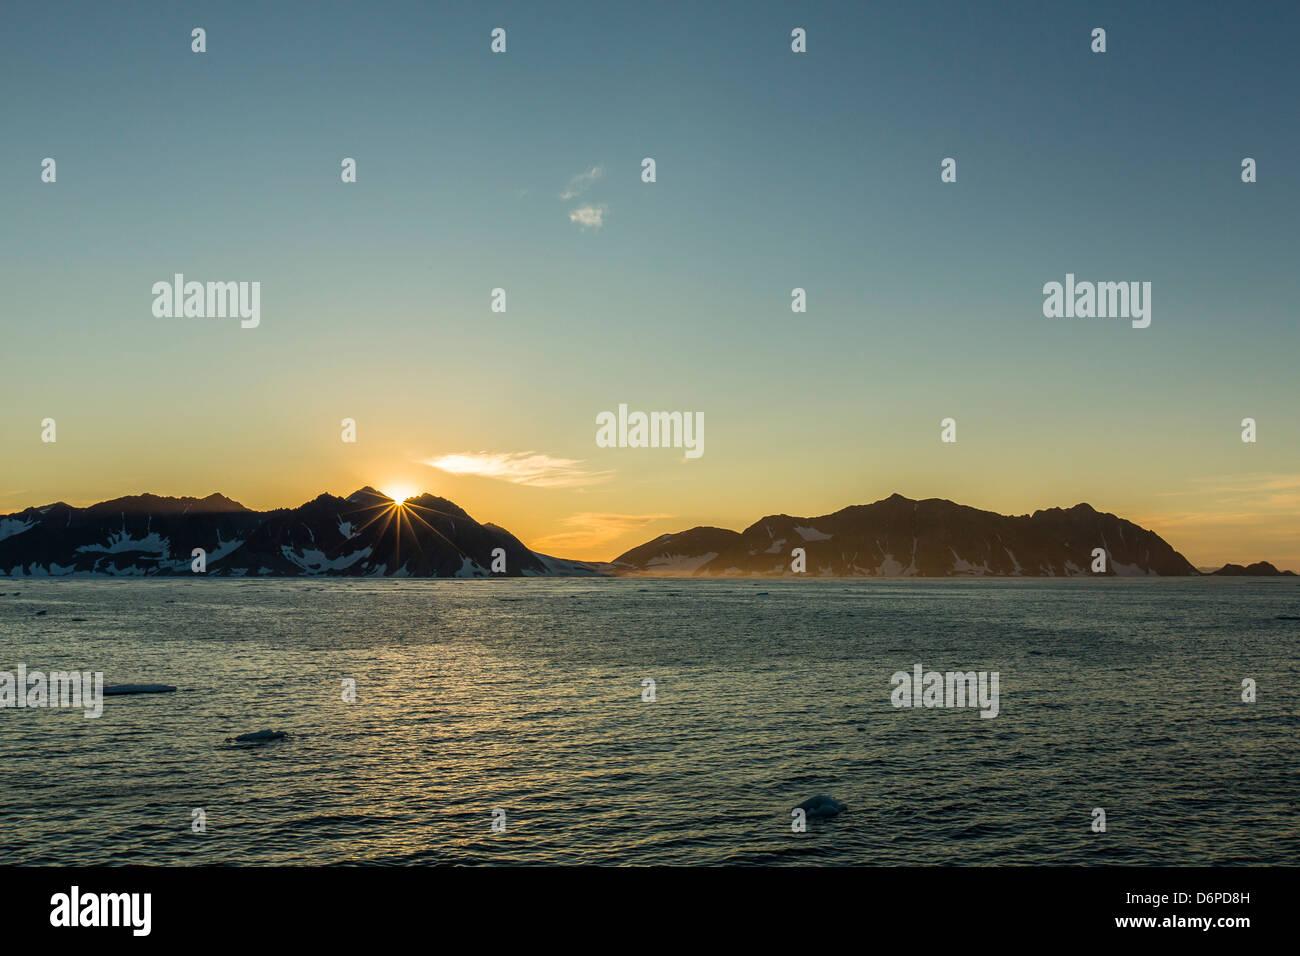 Sunset in Kong Oscar Fjord, Northeast Greenland, Polar Regions - Stock Image